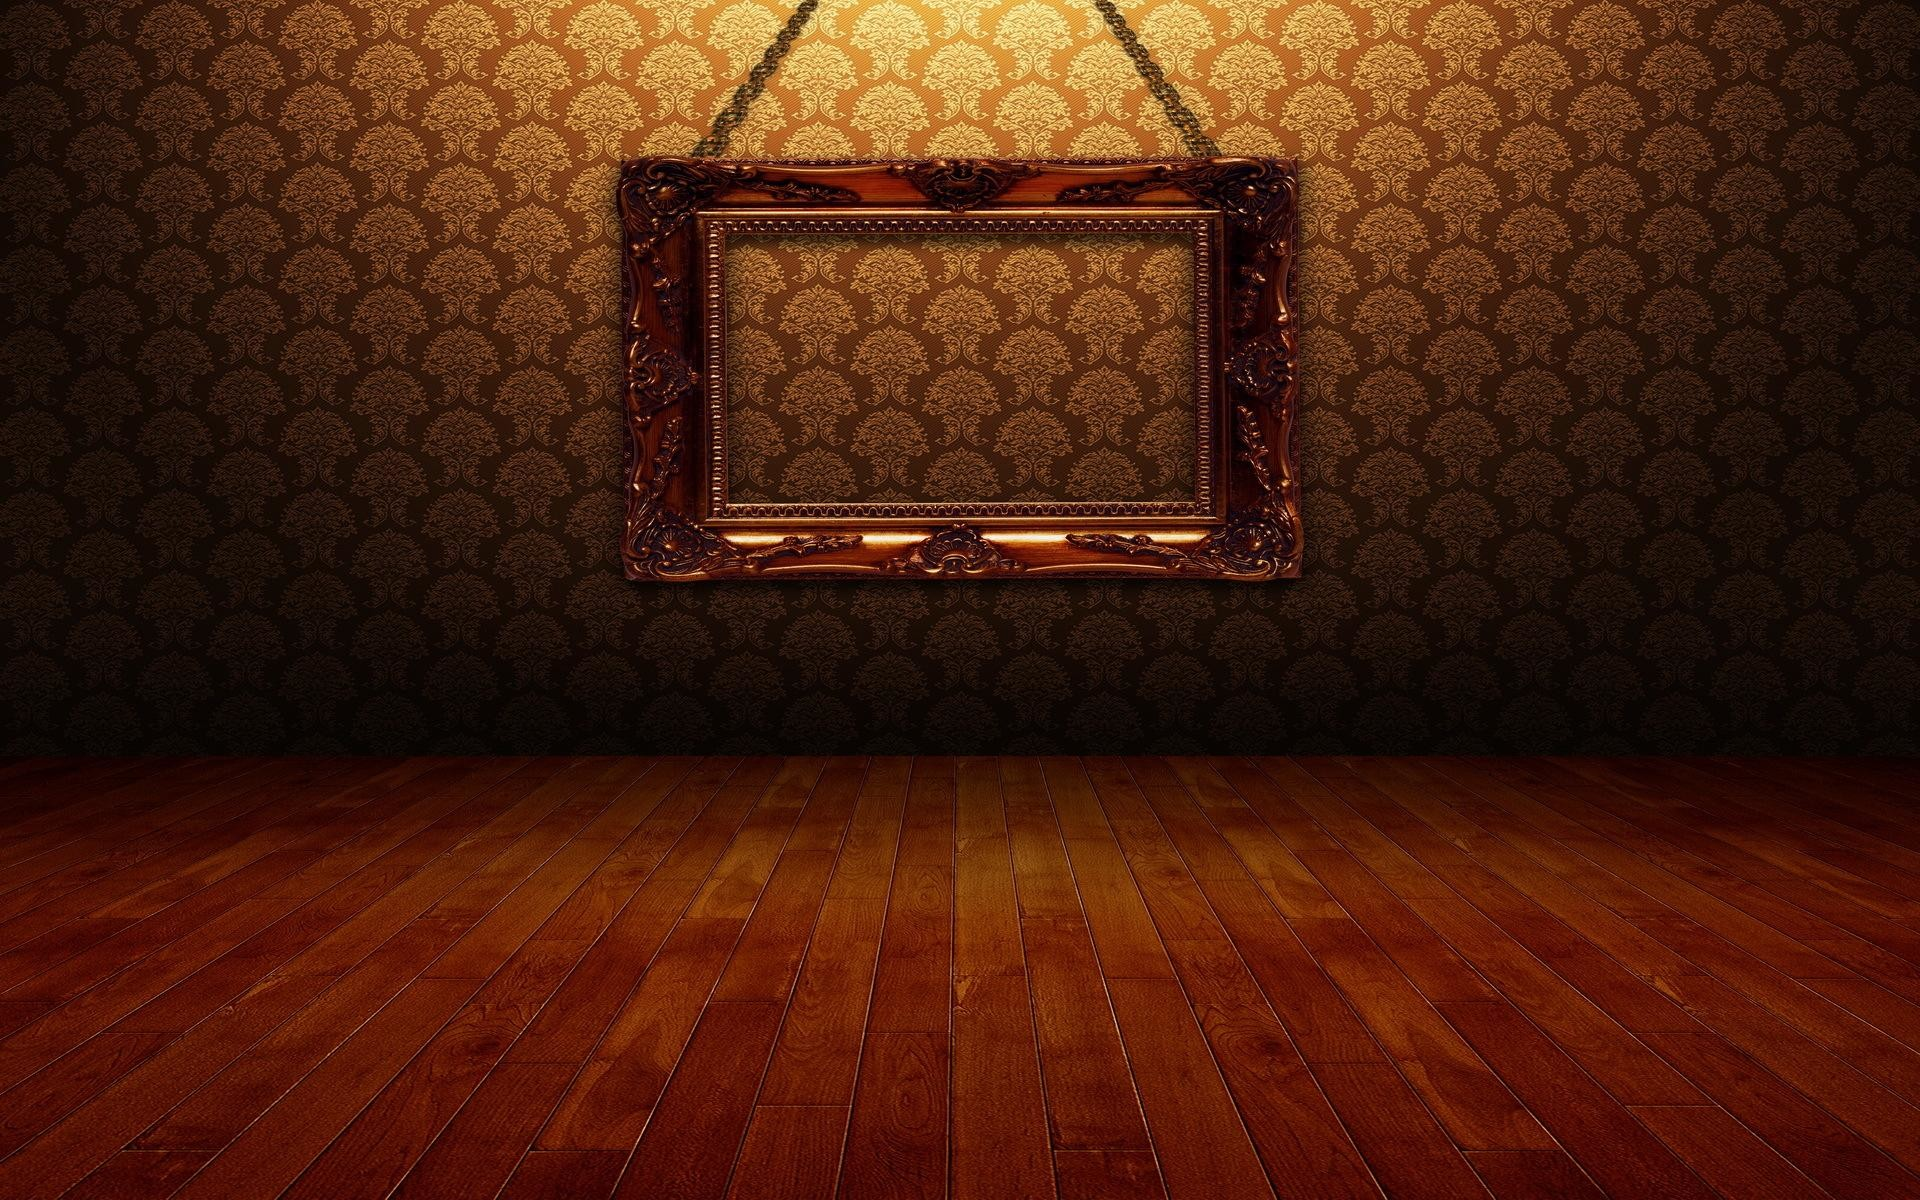 Frames Wallpaper 183 ① Wallpapertag